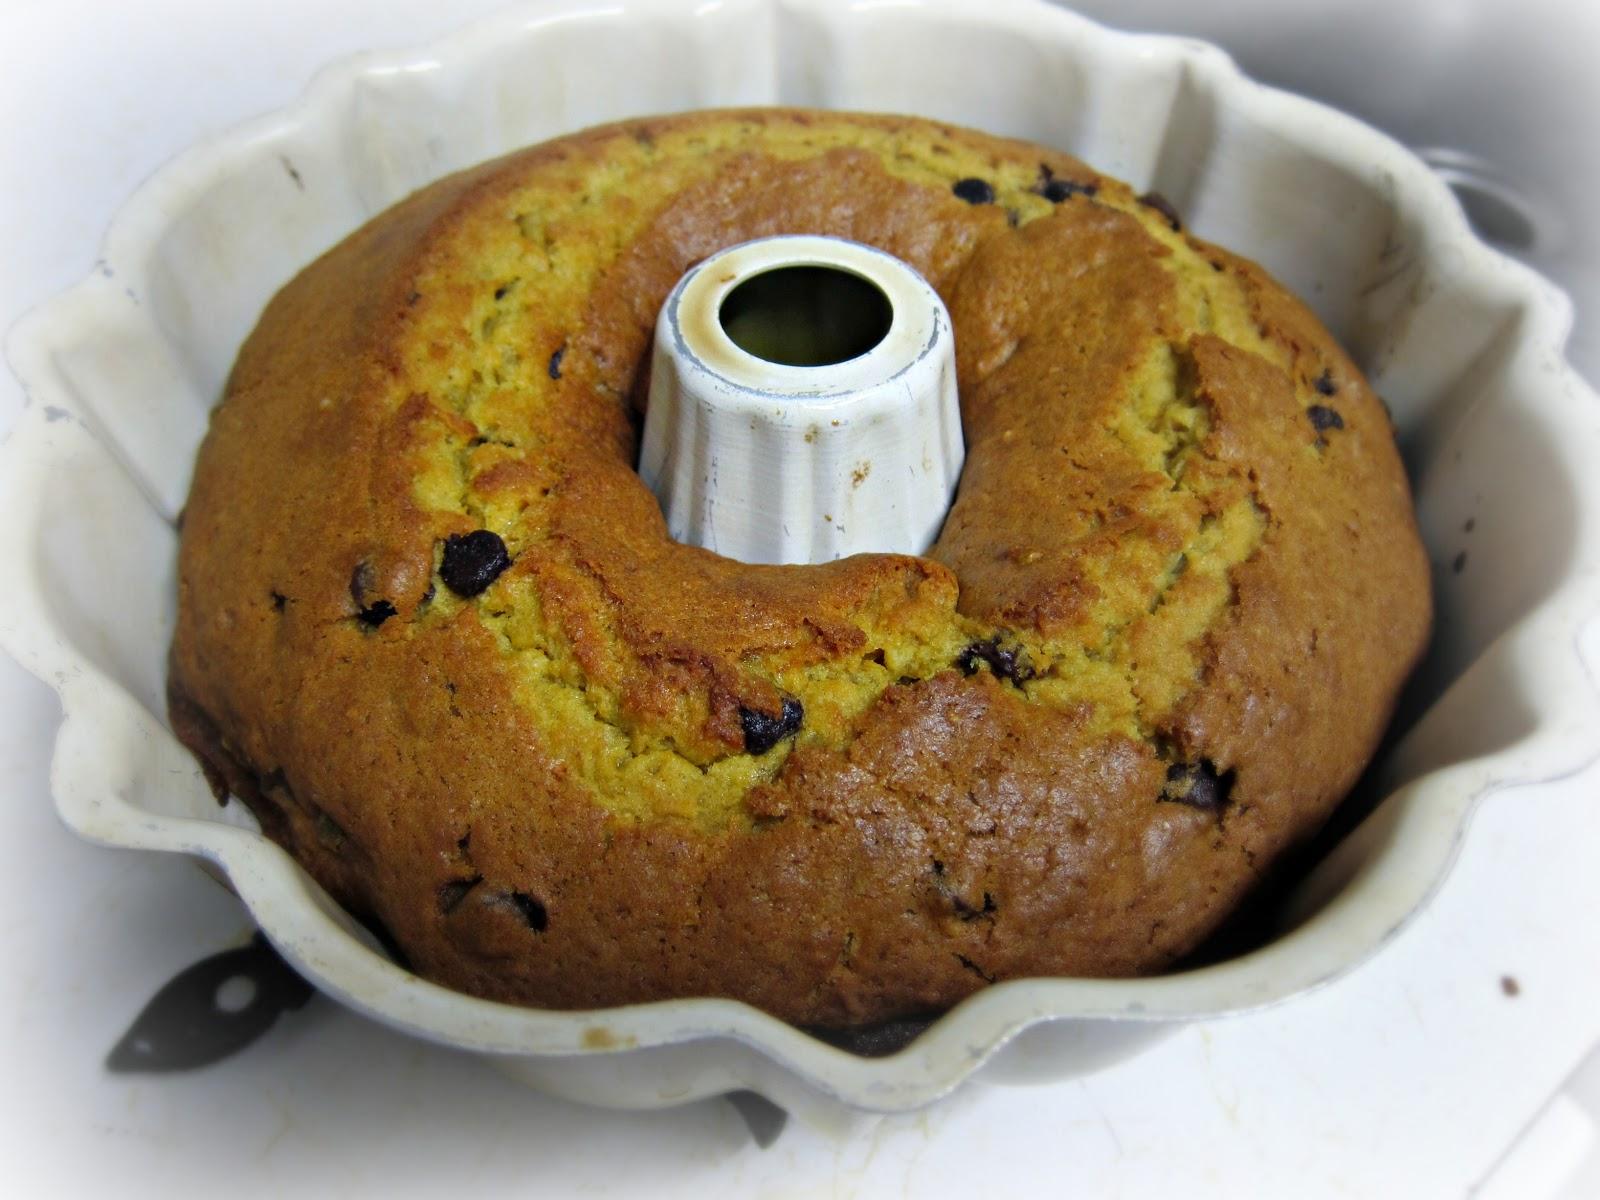 Banana Wonder: Pumpkin-Mahlepi Chocolate Olive Oil Bundt Cake